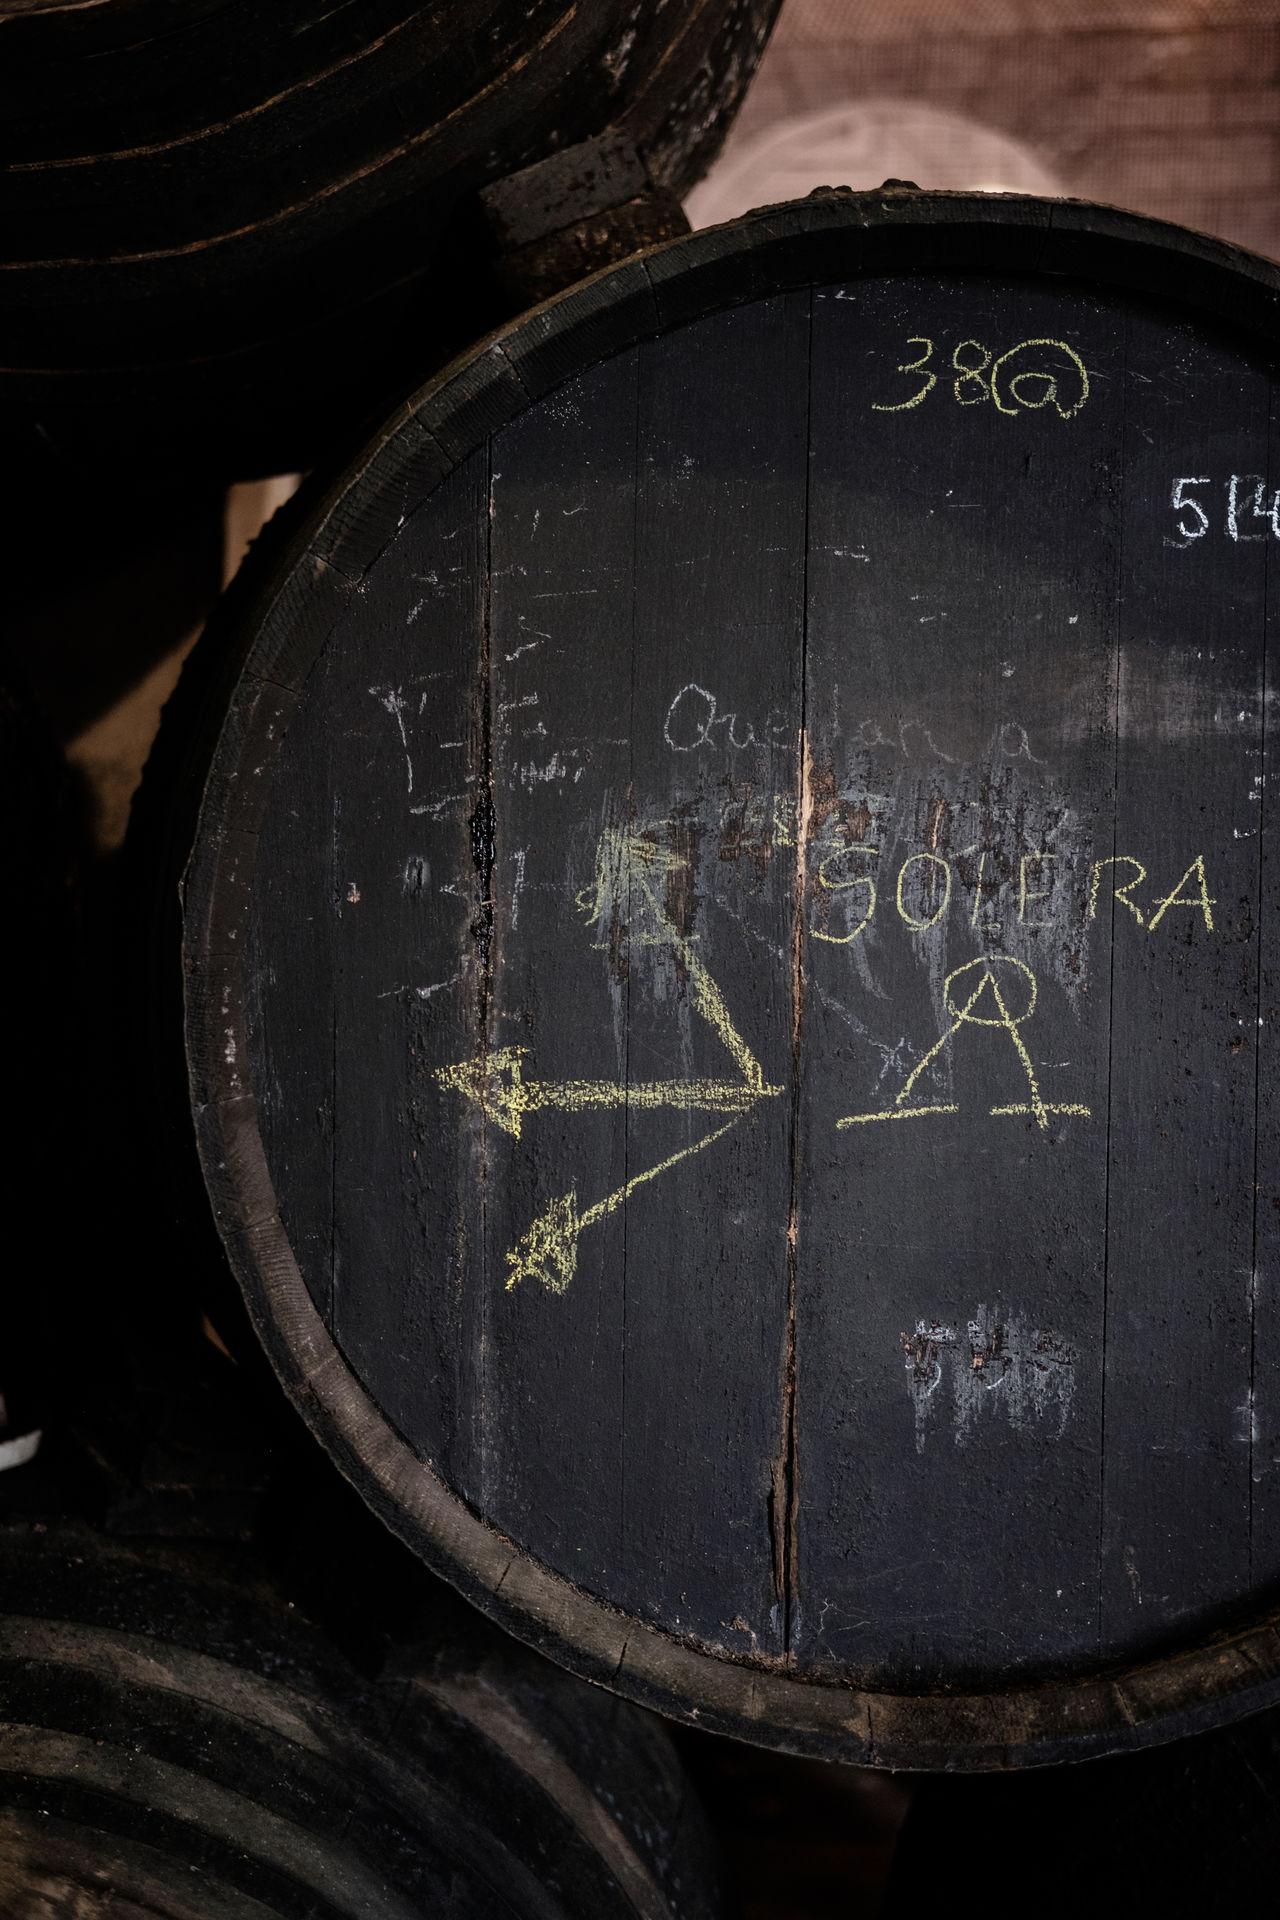 Barrel Barrels Black Bodega Cask Casks Dark Drum No People Oak Patina Production Ripening Sherry Sherry Wine Solera Still Life Wine Winery Wood